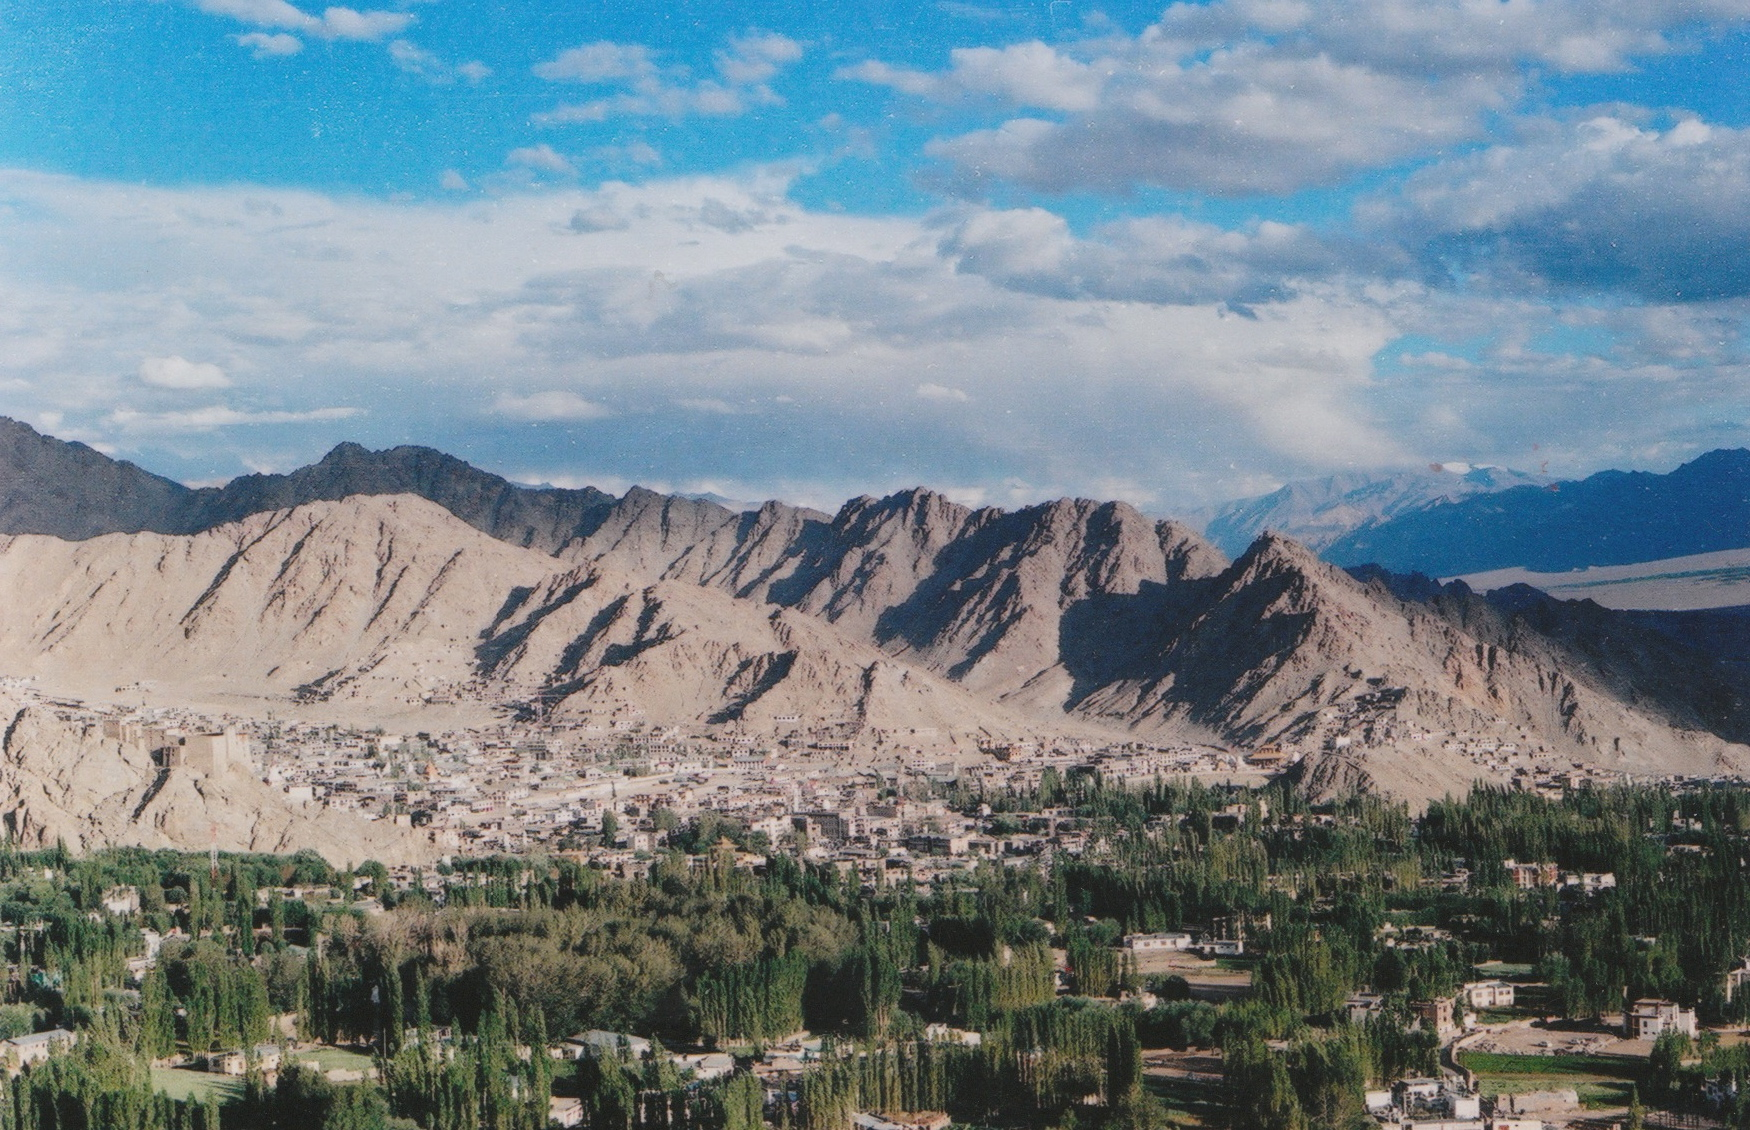 Leh, Ladakh, Northern India, Aug 2012